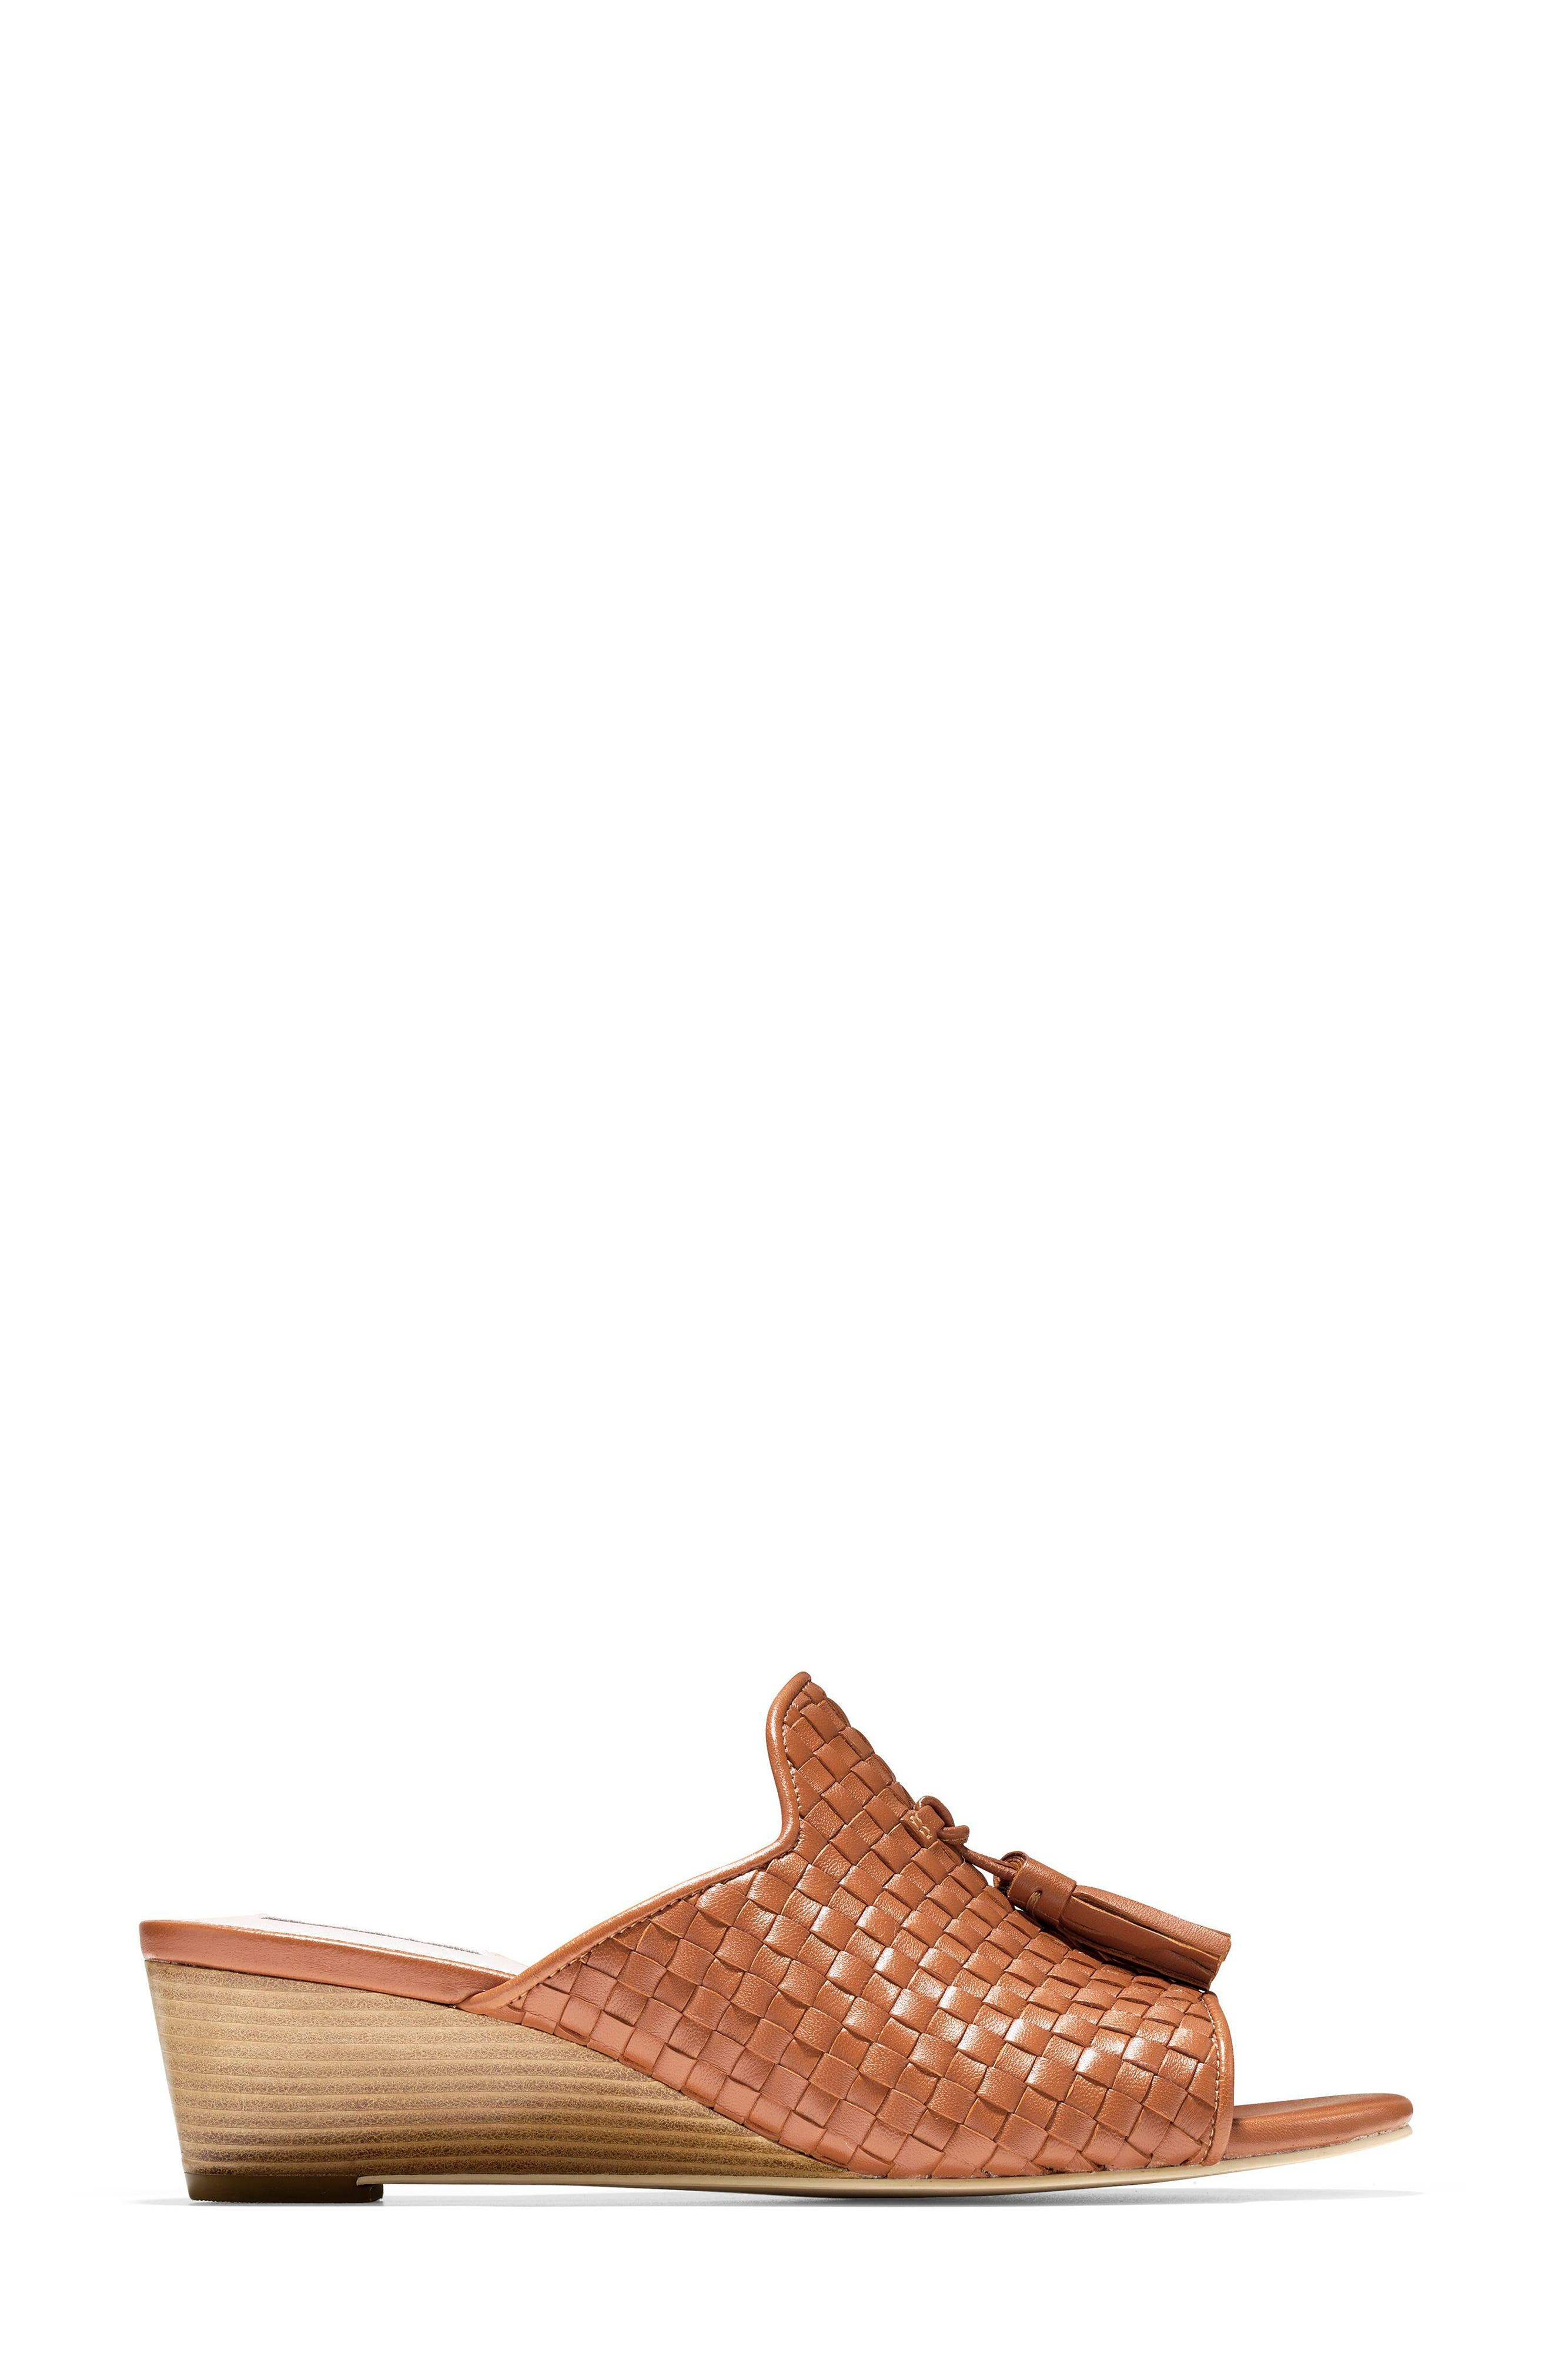 Jagger Wedge Sandal,                             Alternate thumbnail 3, color,                             Acorn Leather